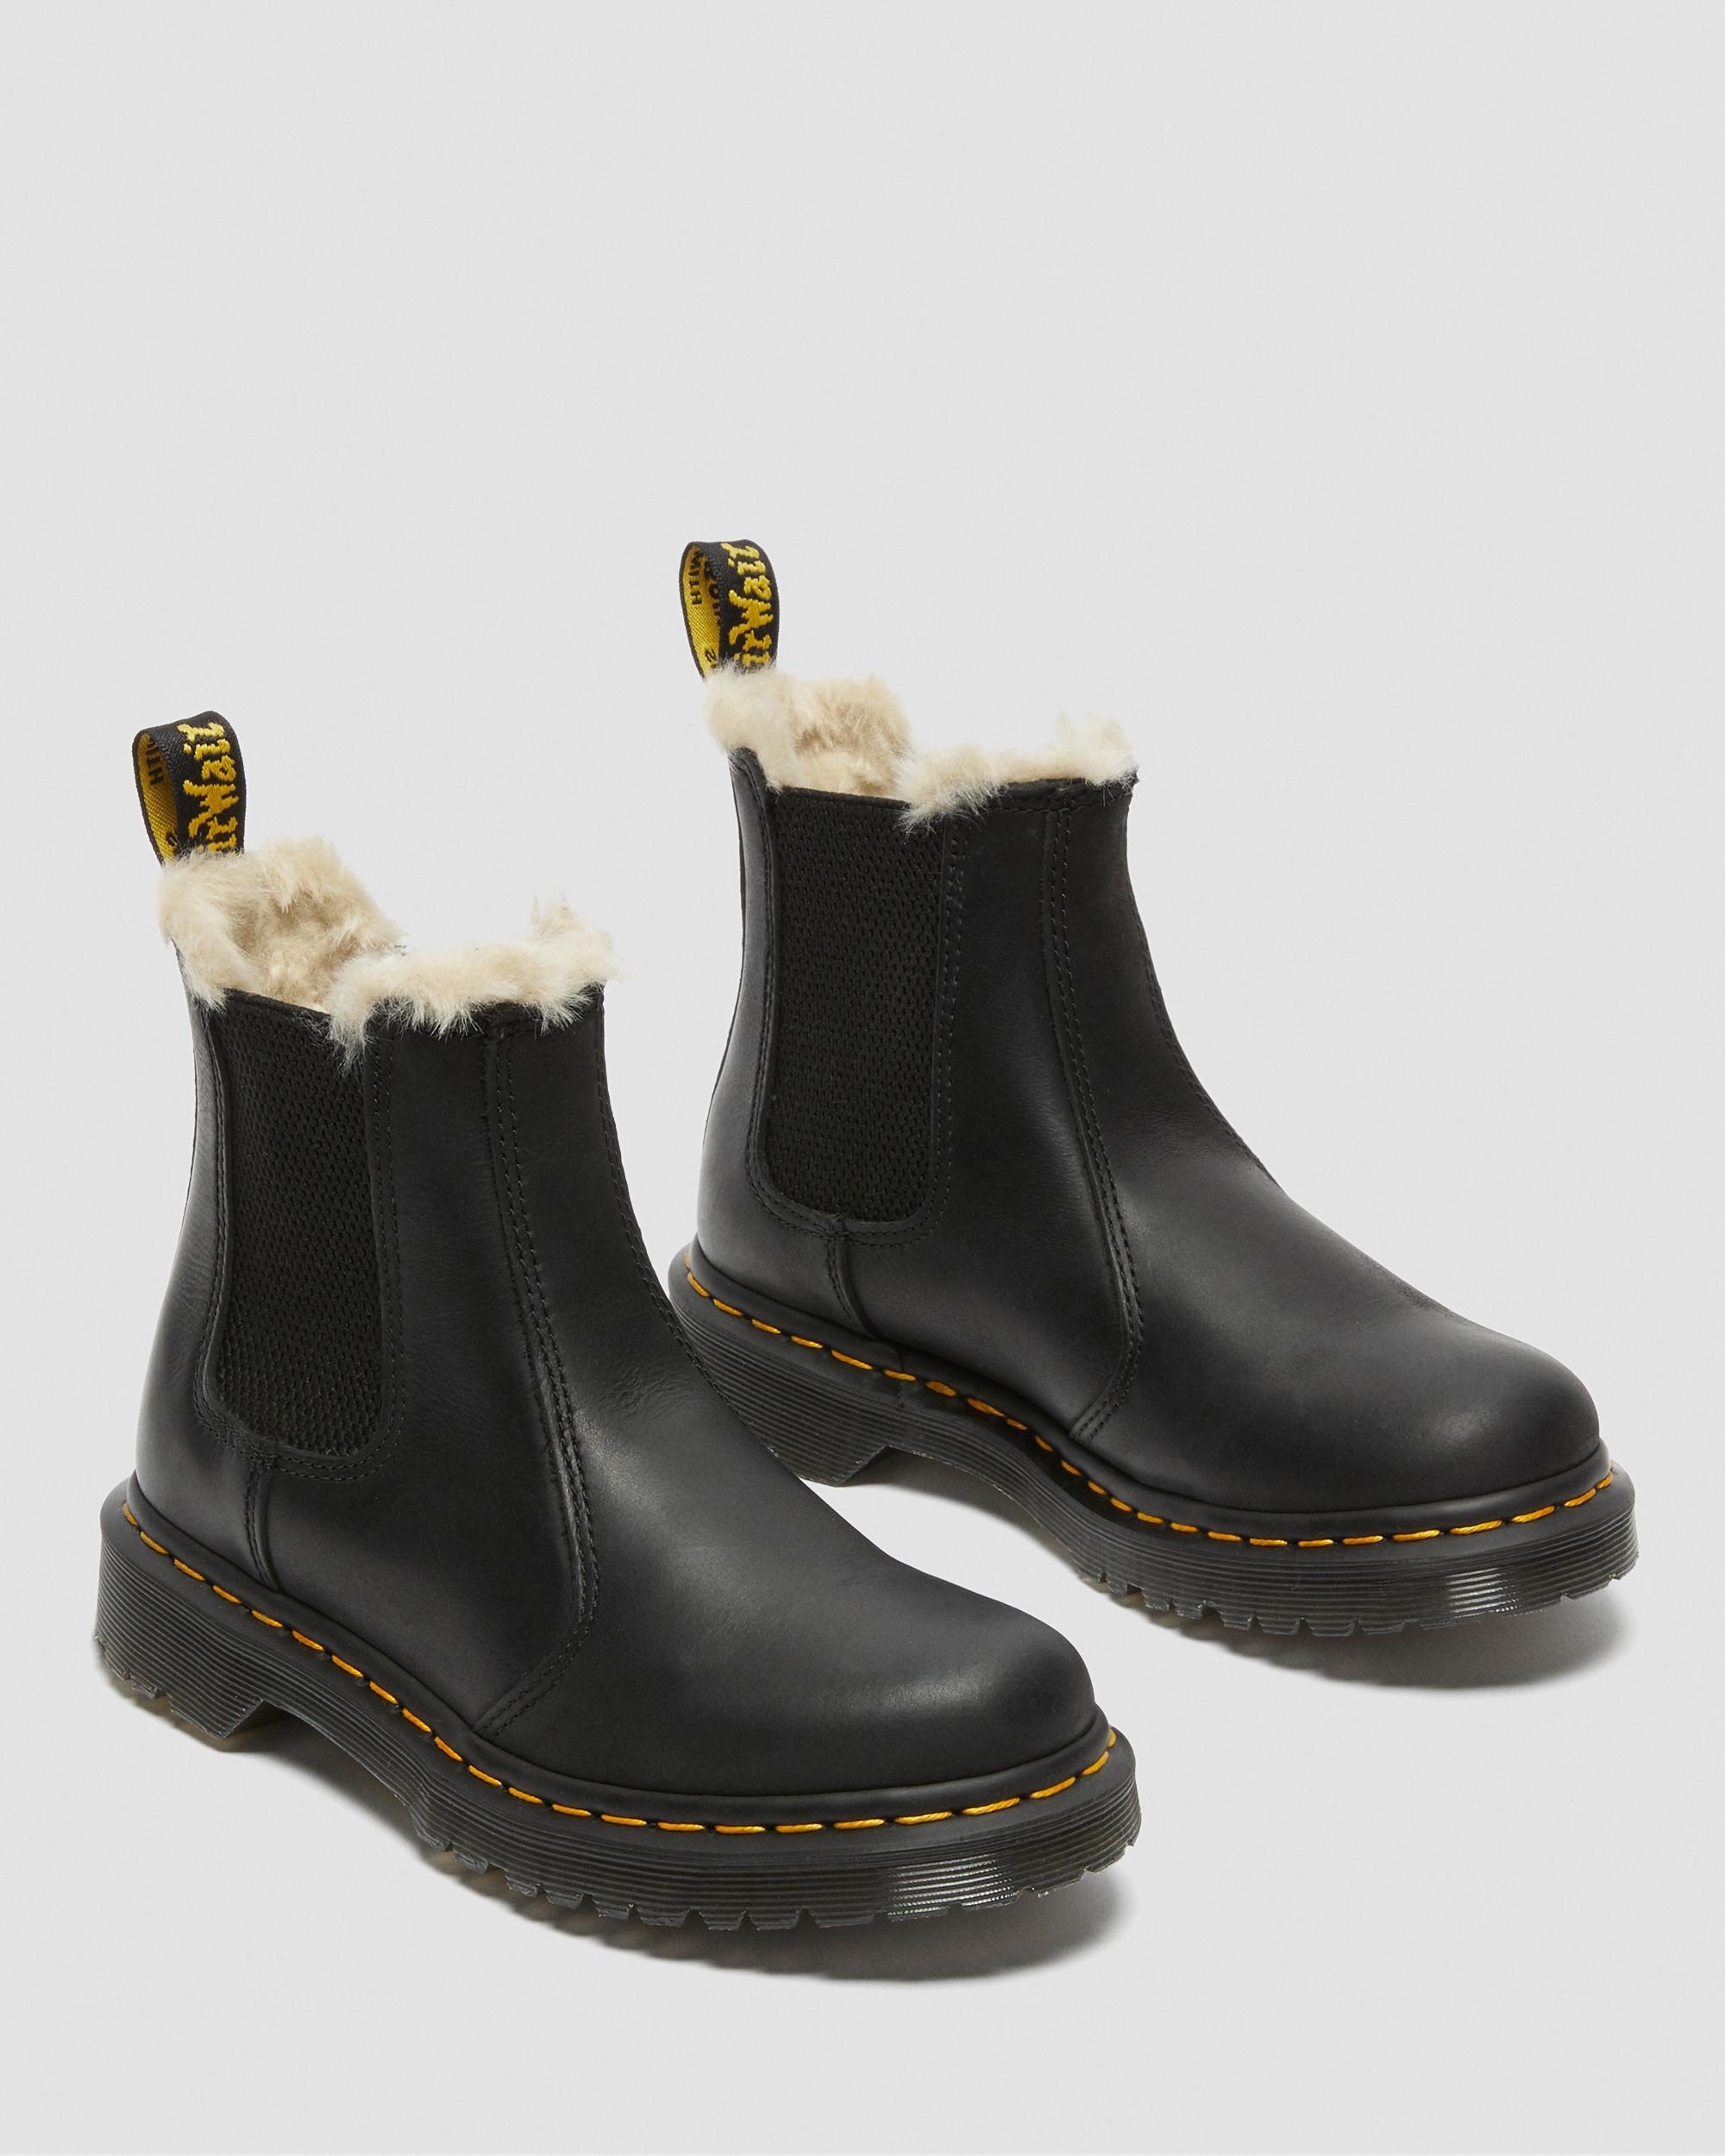 Dr. Martens Popular Womens Chelsea Boots Black Fur Lined